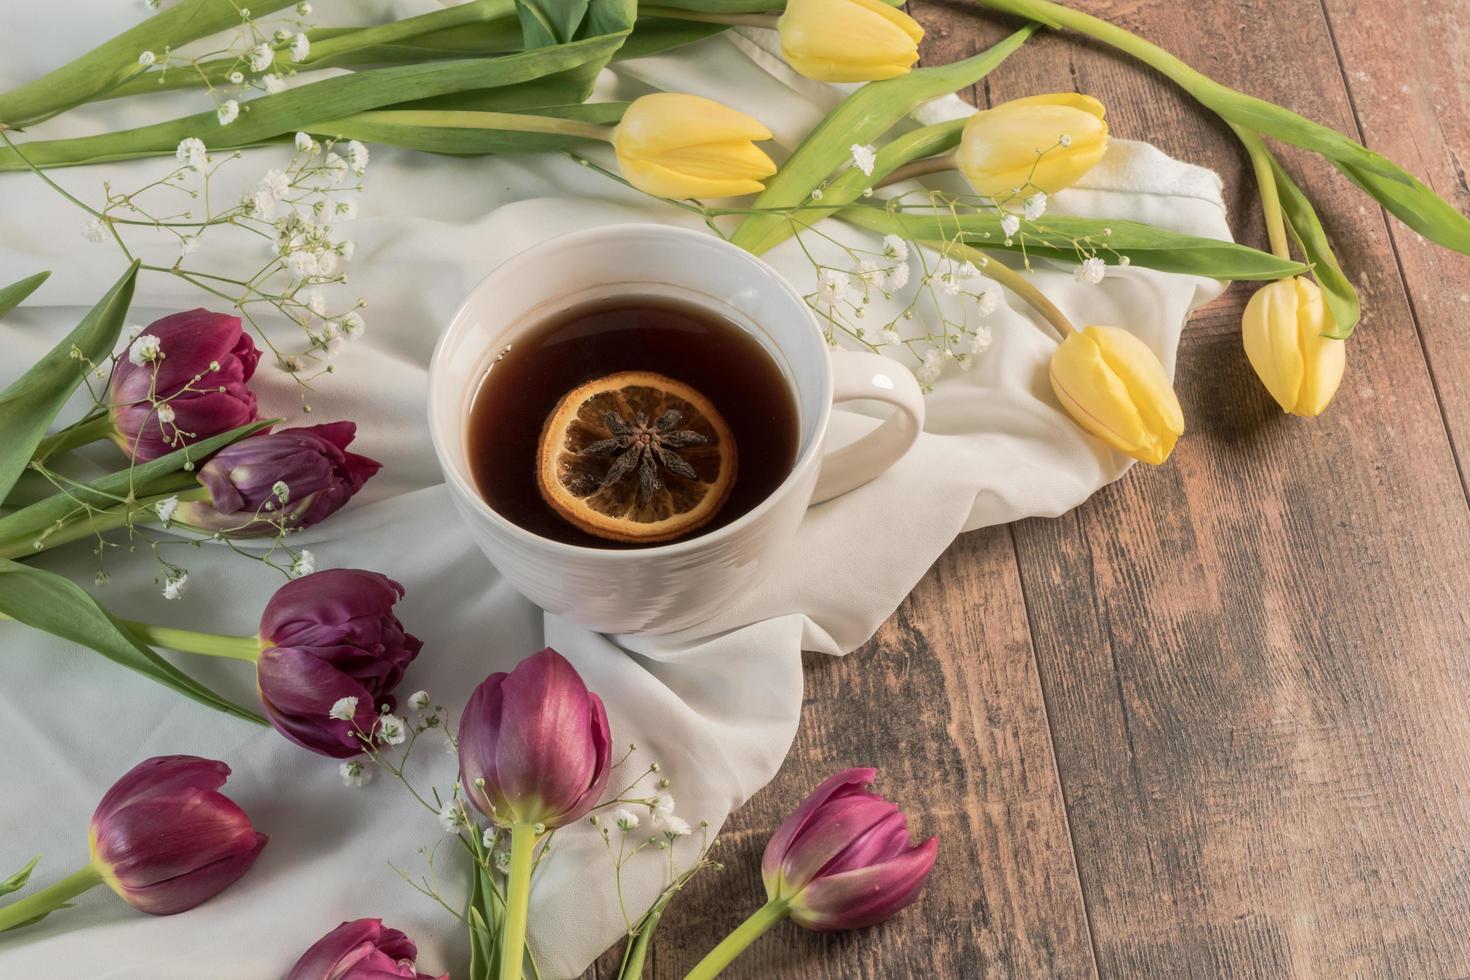 Tea and tulips lifestyle photo